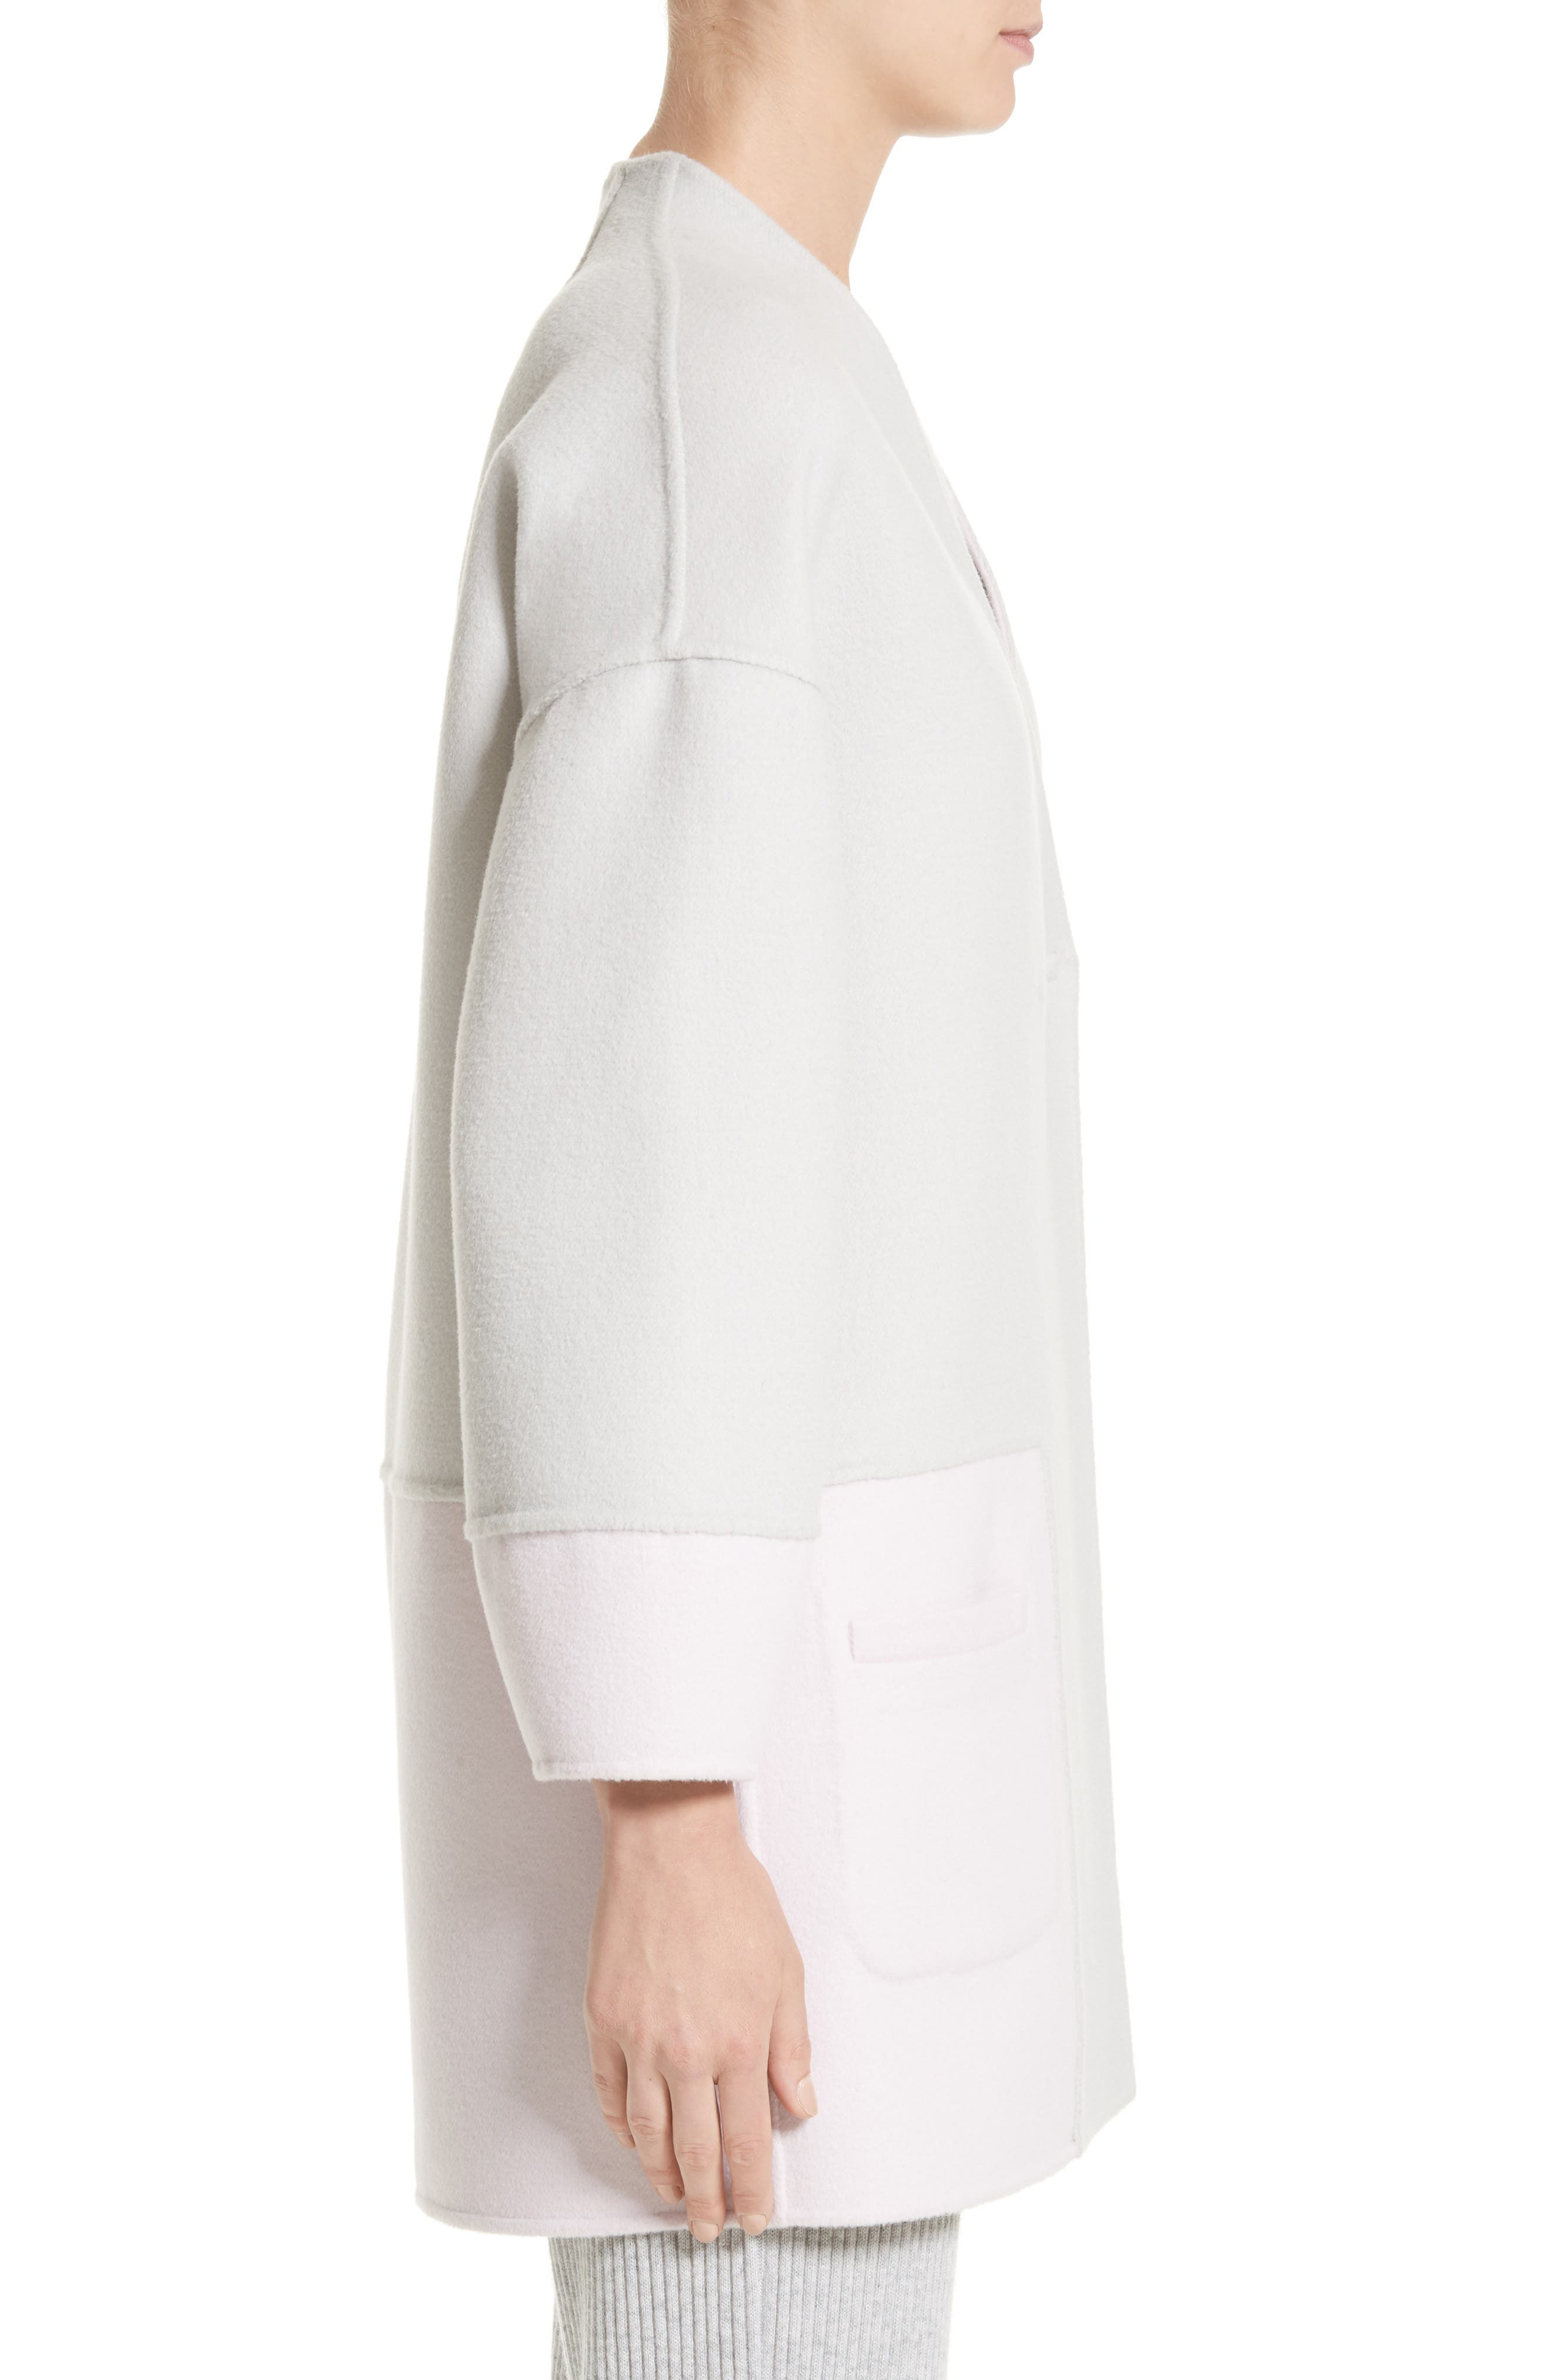 Reversible Wool Blend Cocoon Coat,                             Alternate thumbnail 3, color,                             Petal/ Light Grey Melange